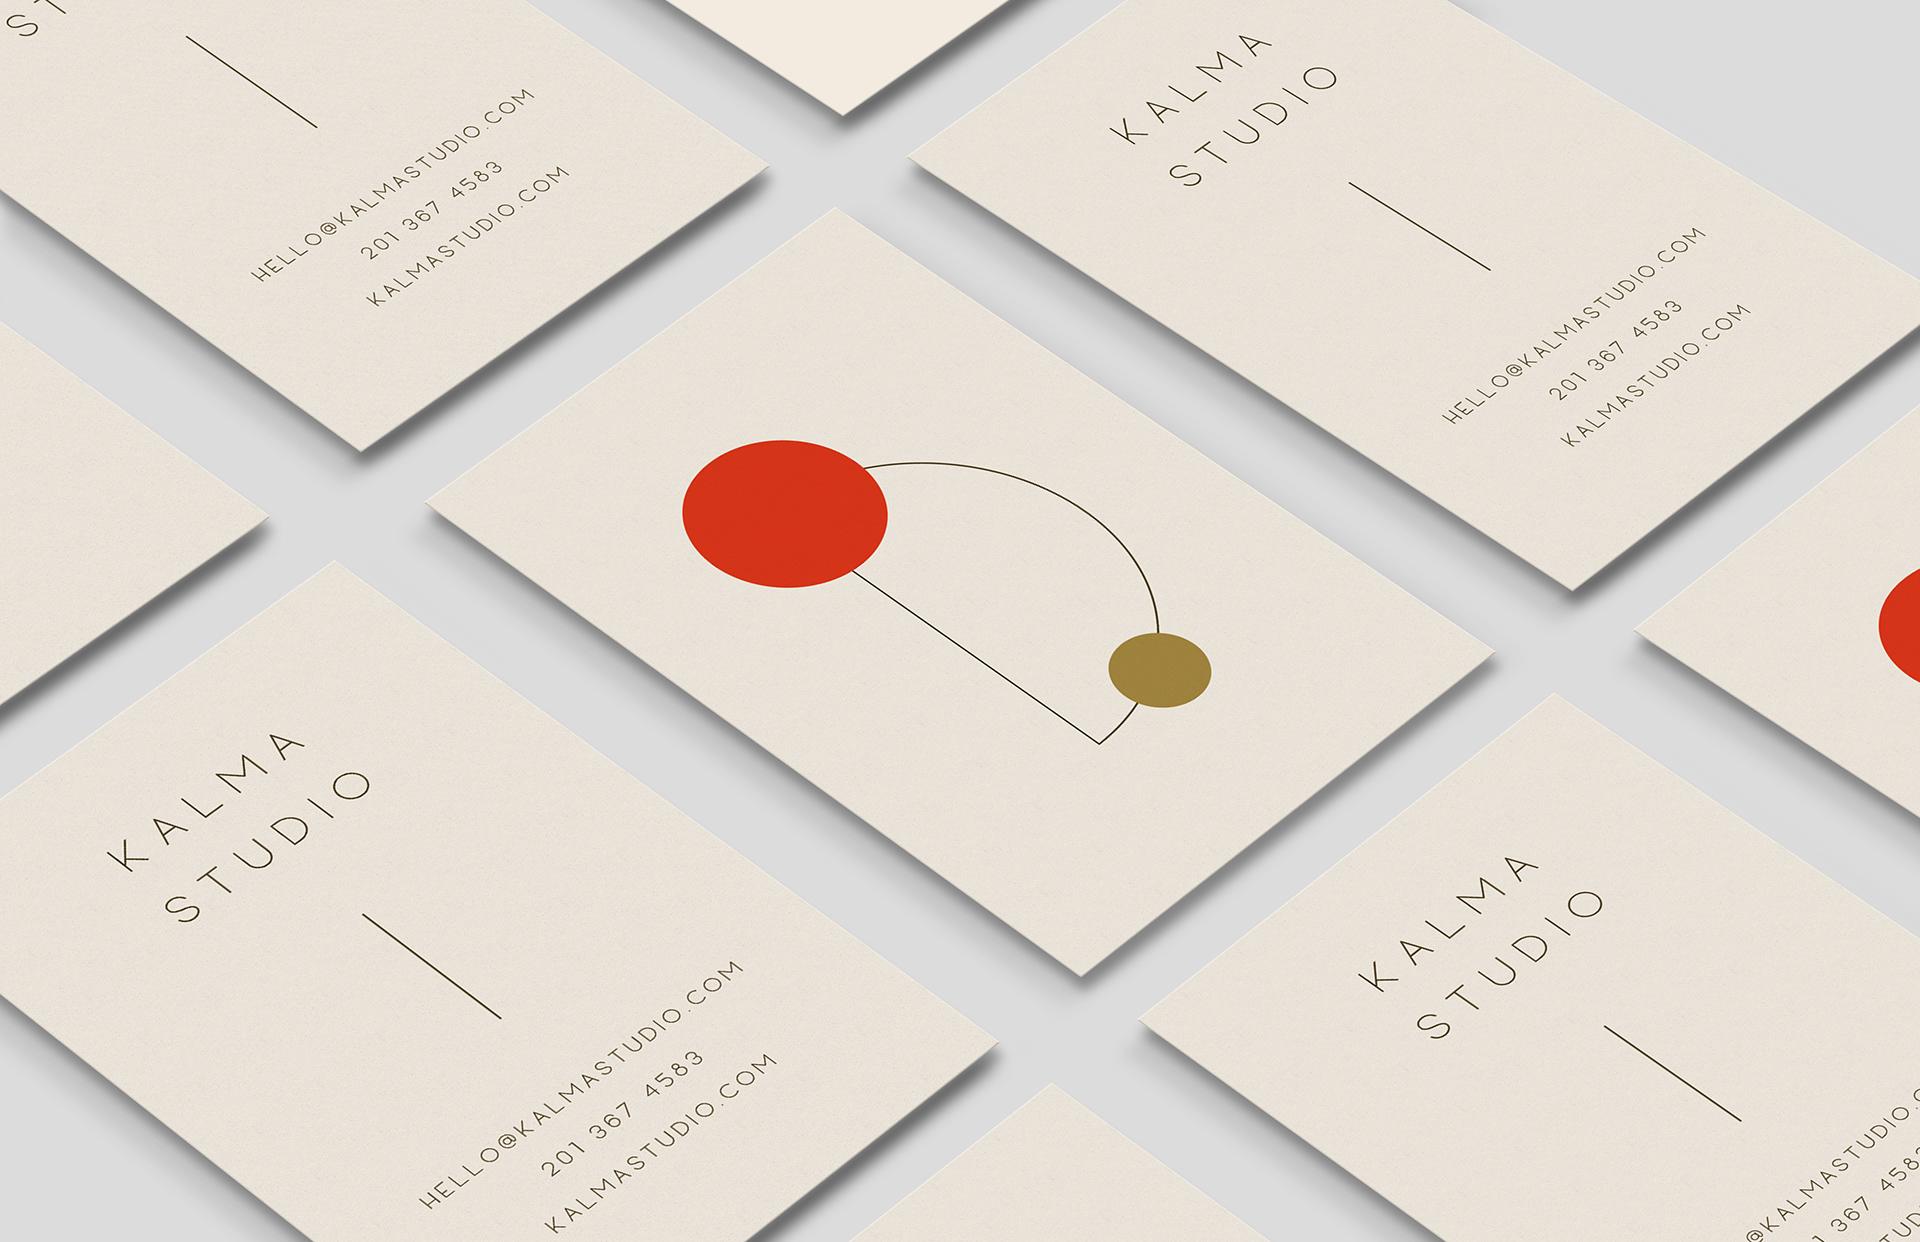 Mẫu thiết kế danh thiếp cực kỳ đơn giản của designer Veronika DesignLoockStudio